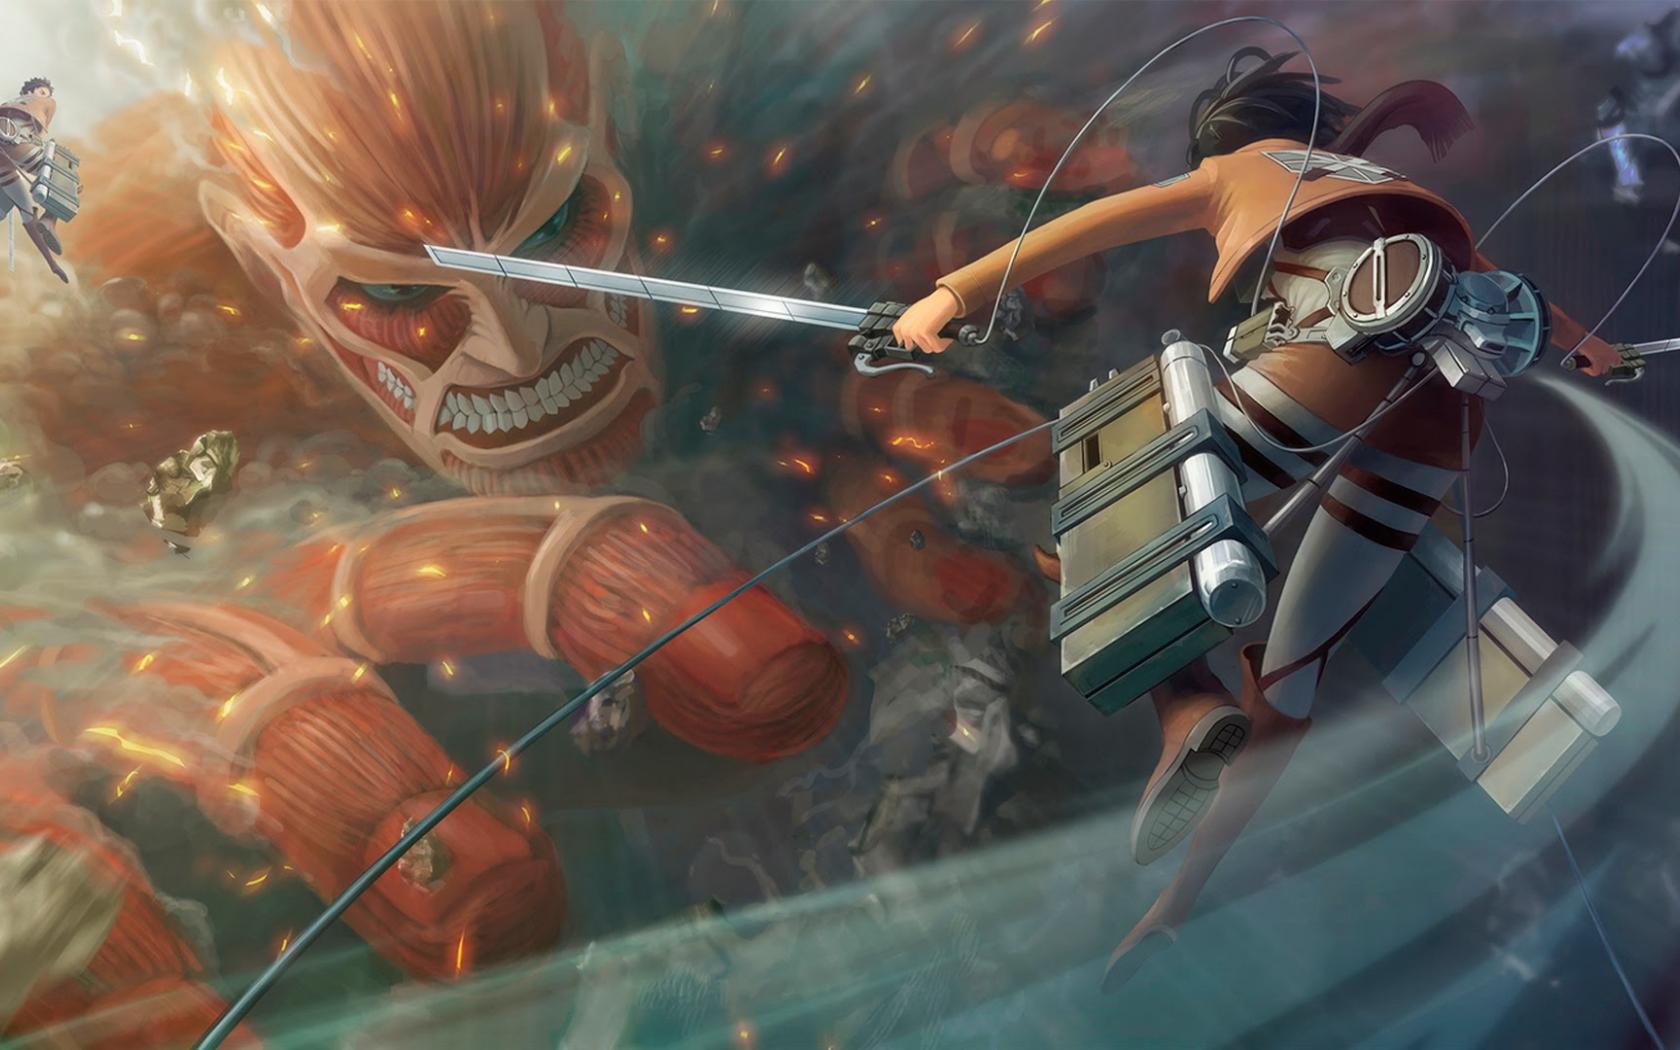 Free Download Attack On Titan Wallpaper Hd Eren Titan 1920x1080